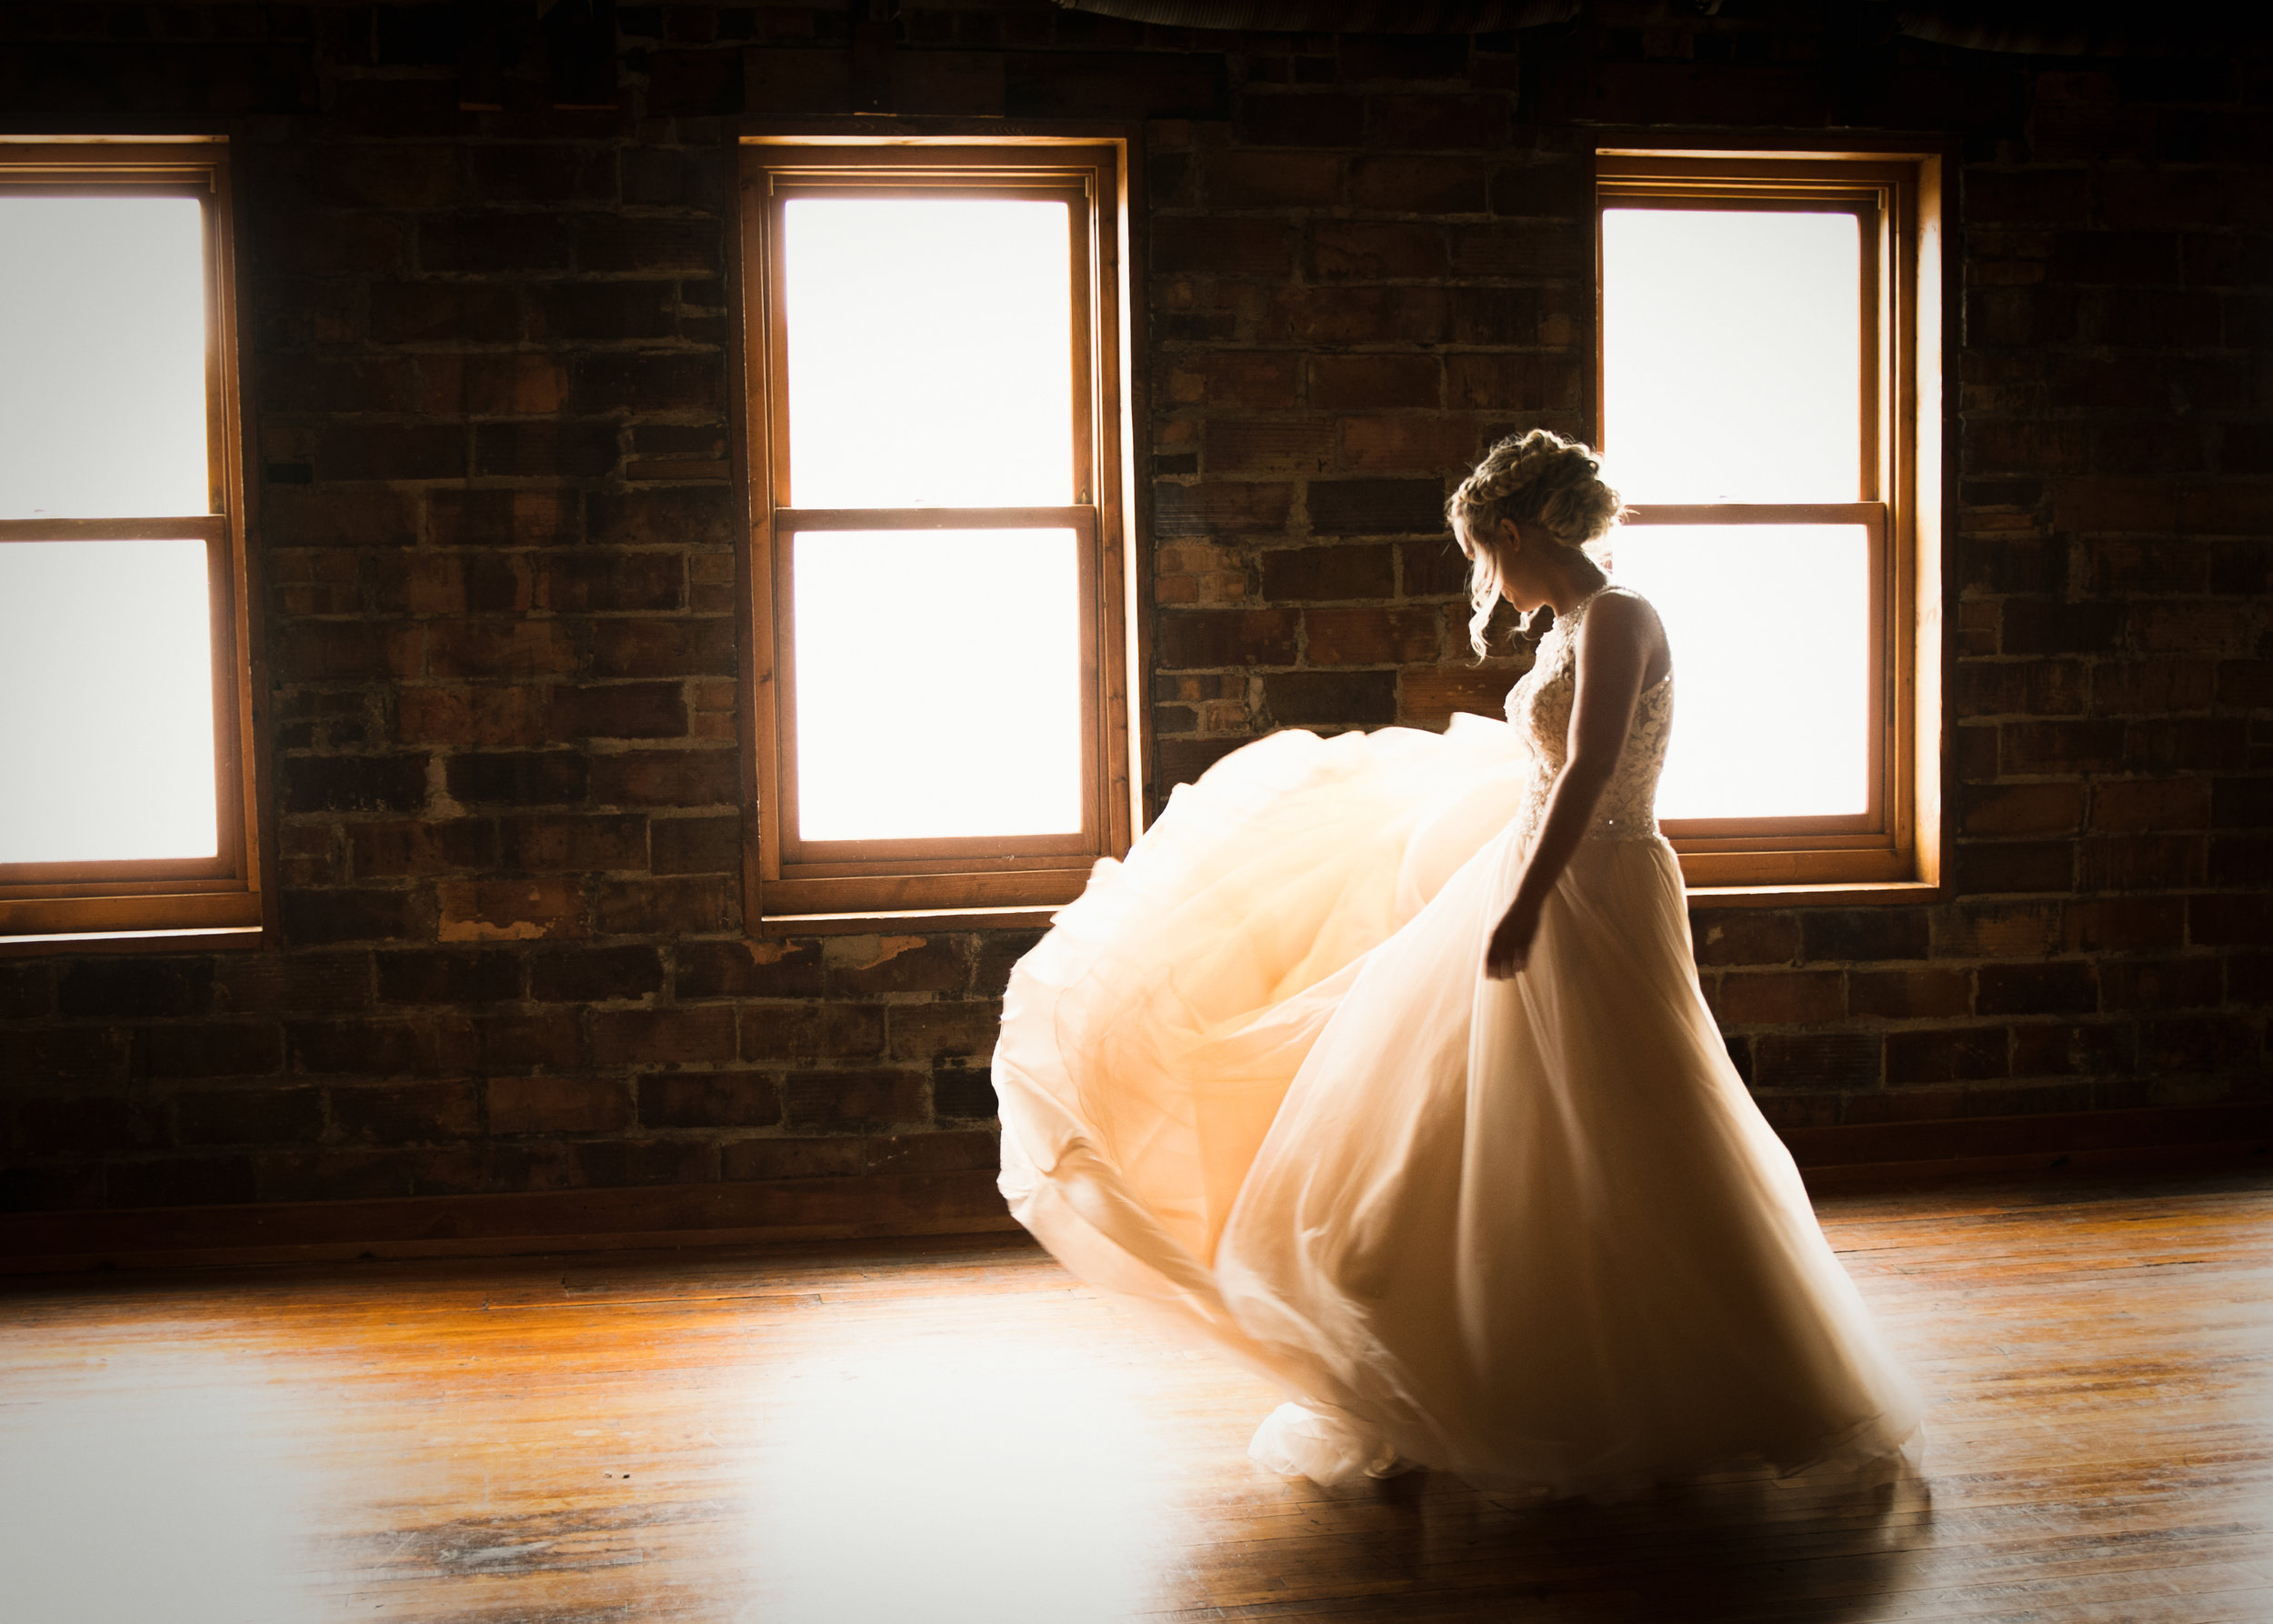 Kristie Dancing on Her Wedding Day